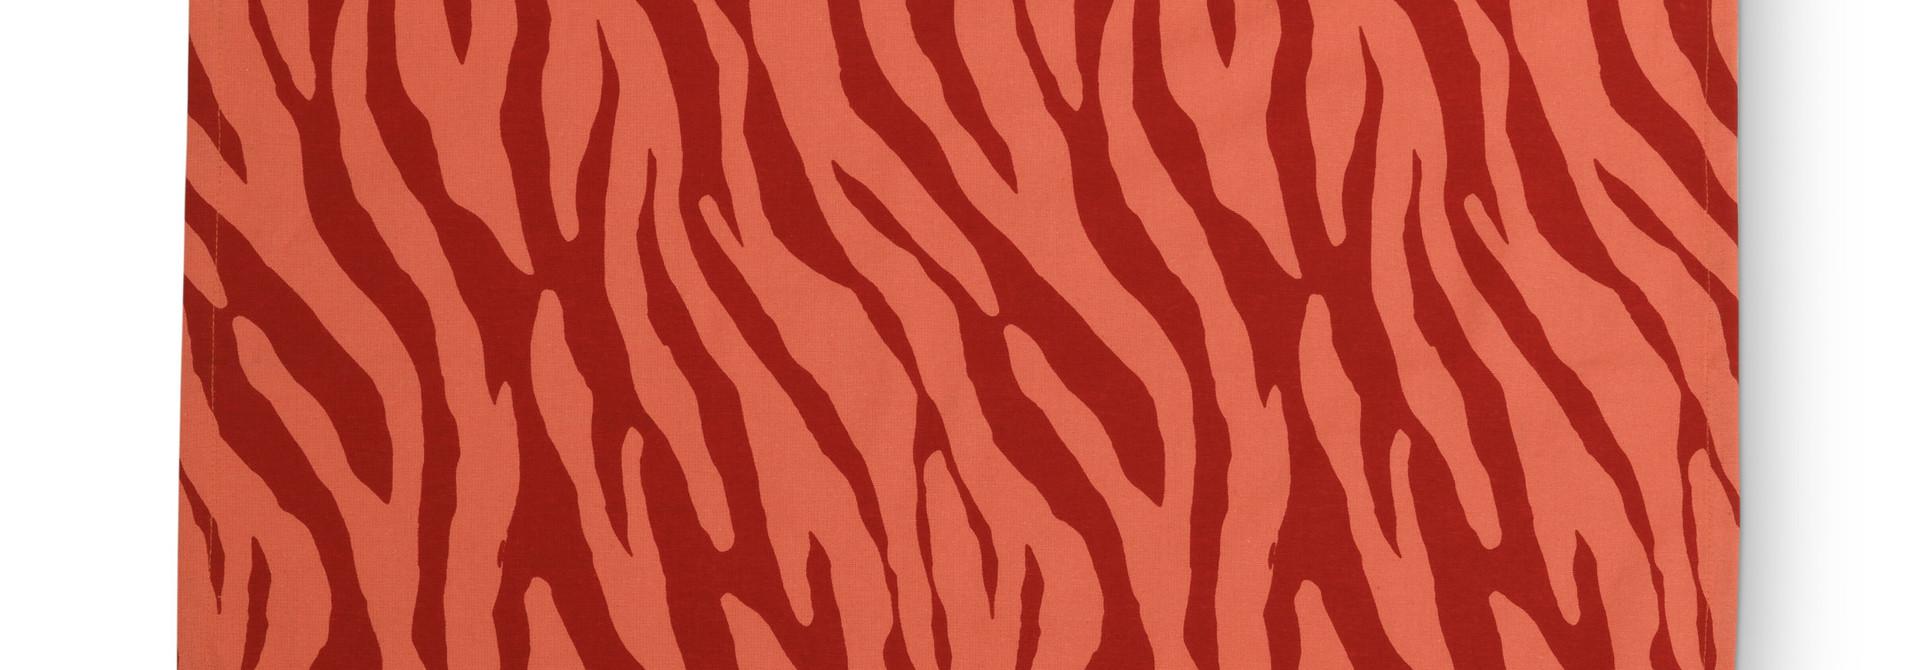 Tea Towel Zebra Stripes 60x60cm